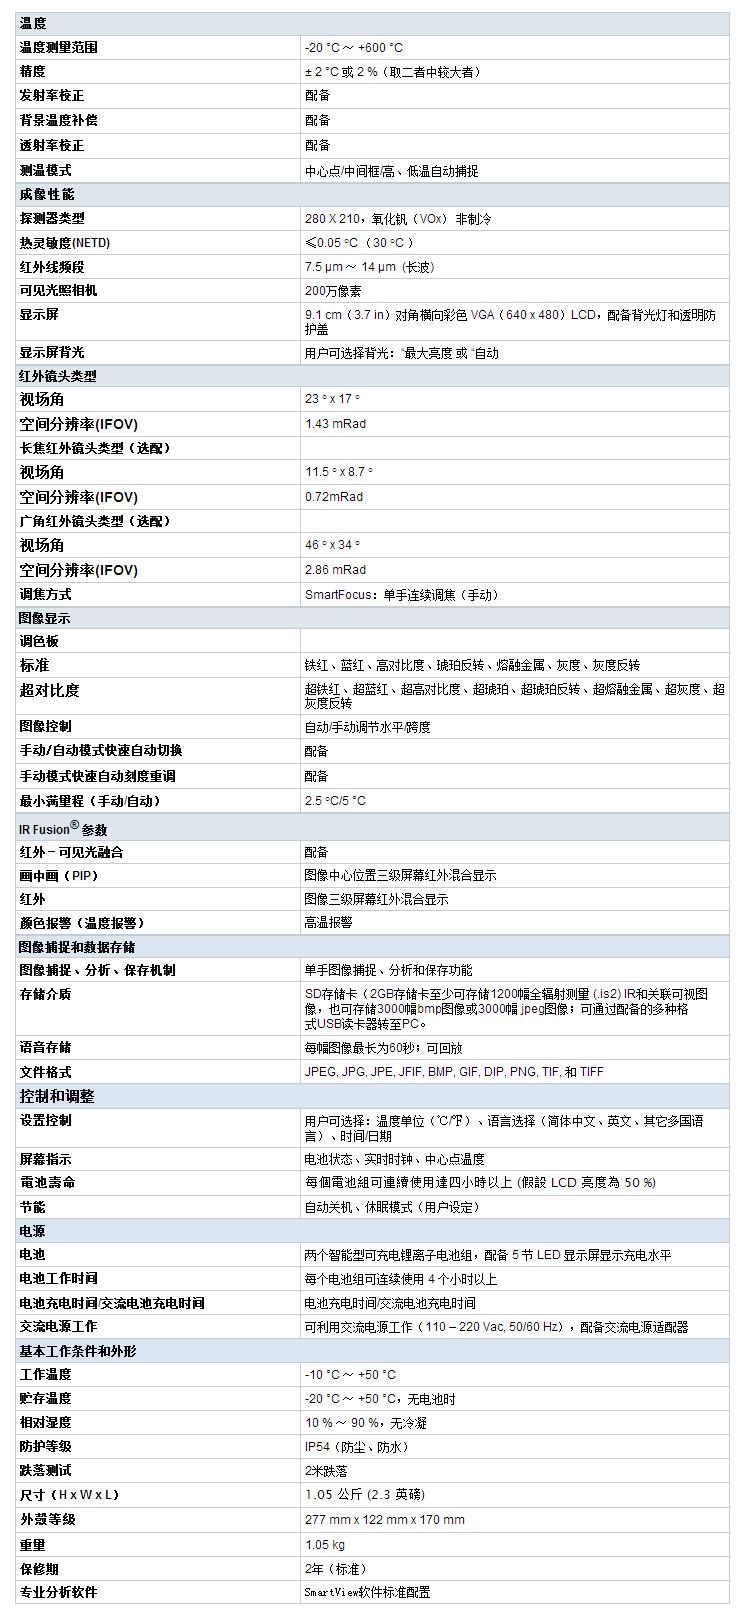 Ti29 红外热像仪的技术指标及功能特点